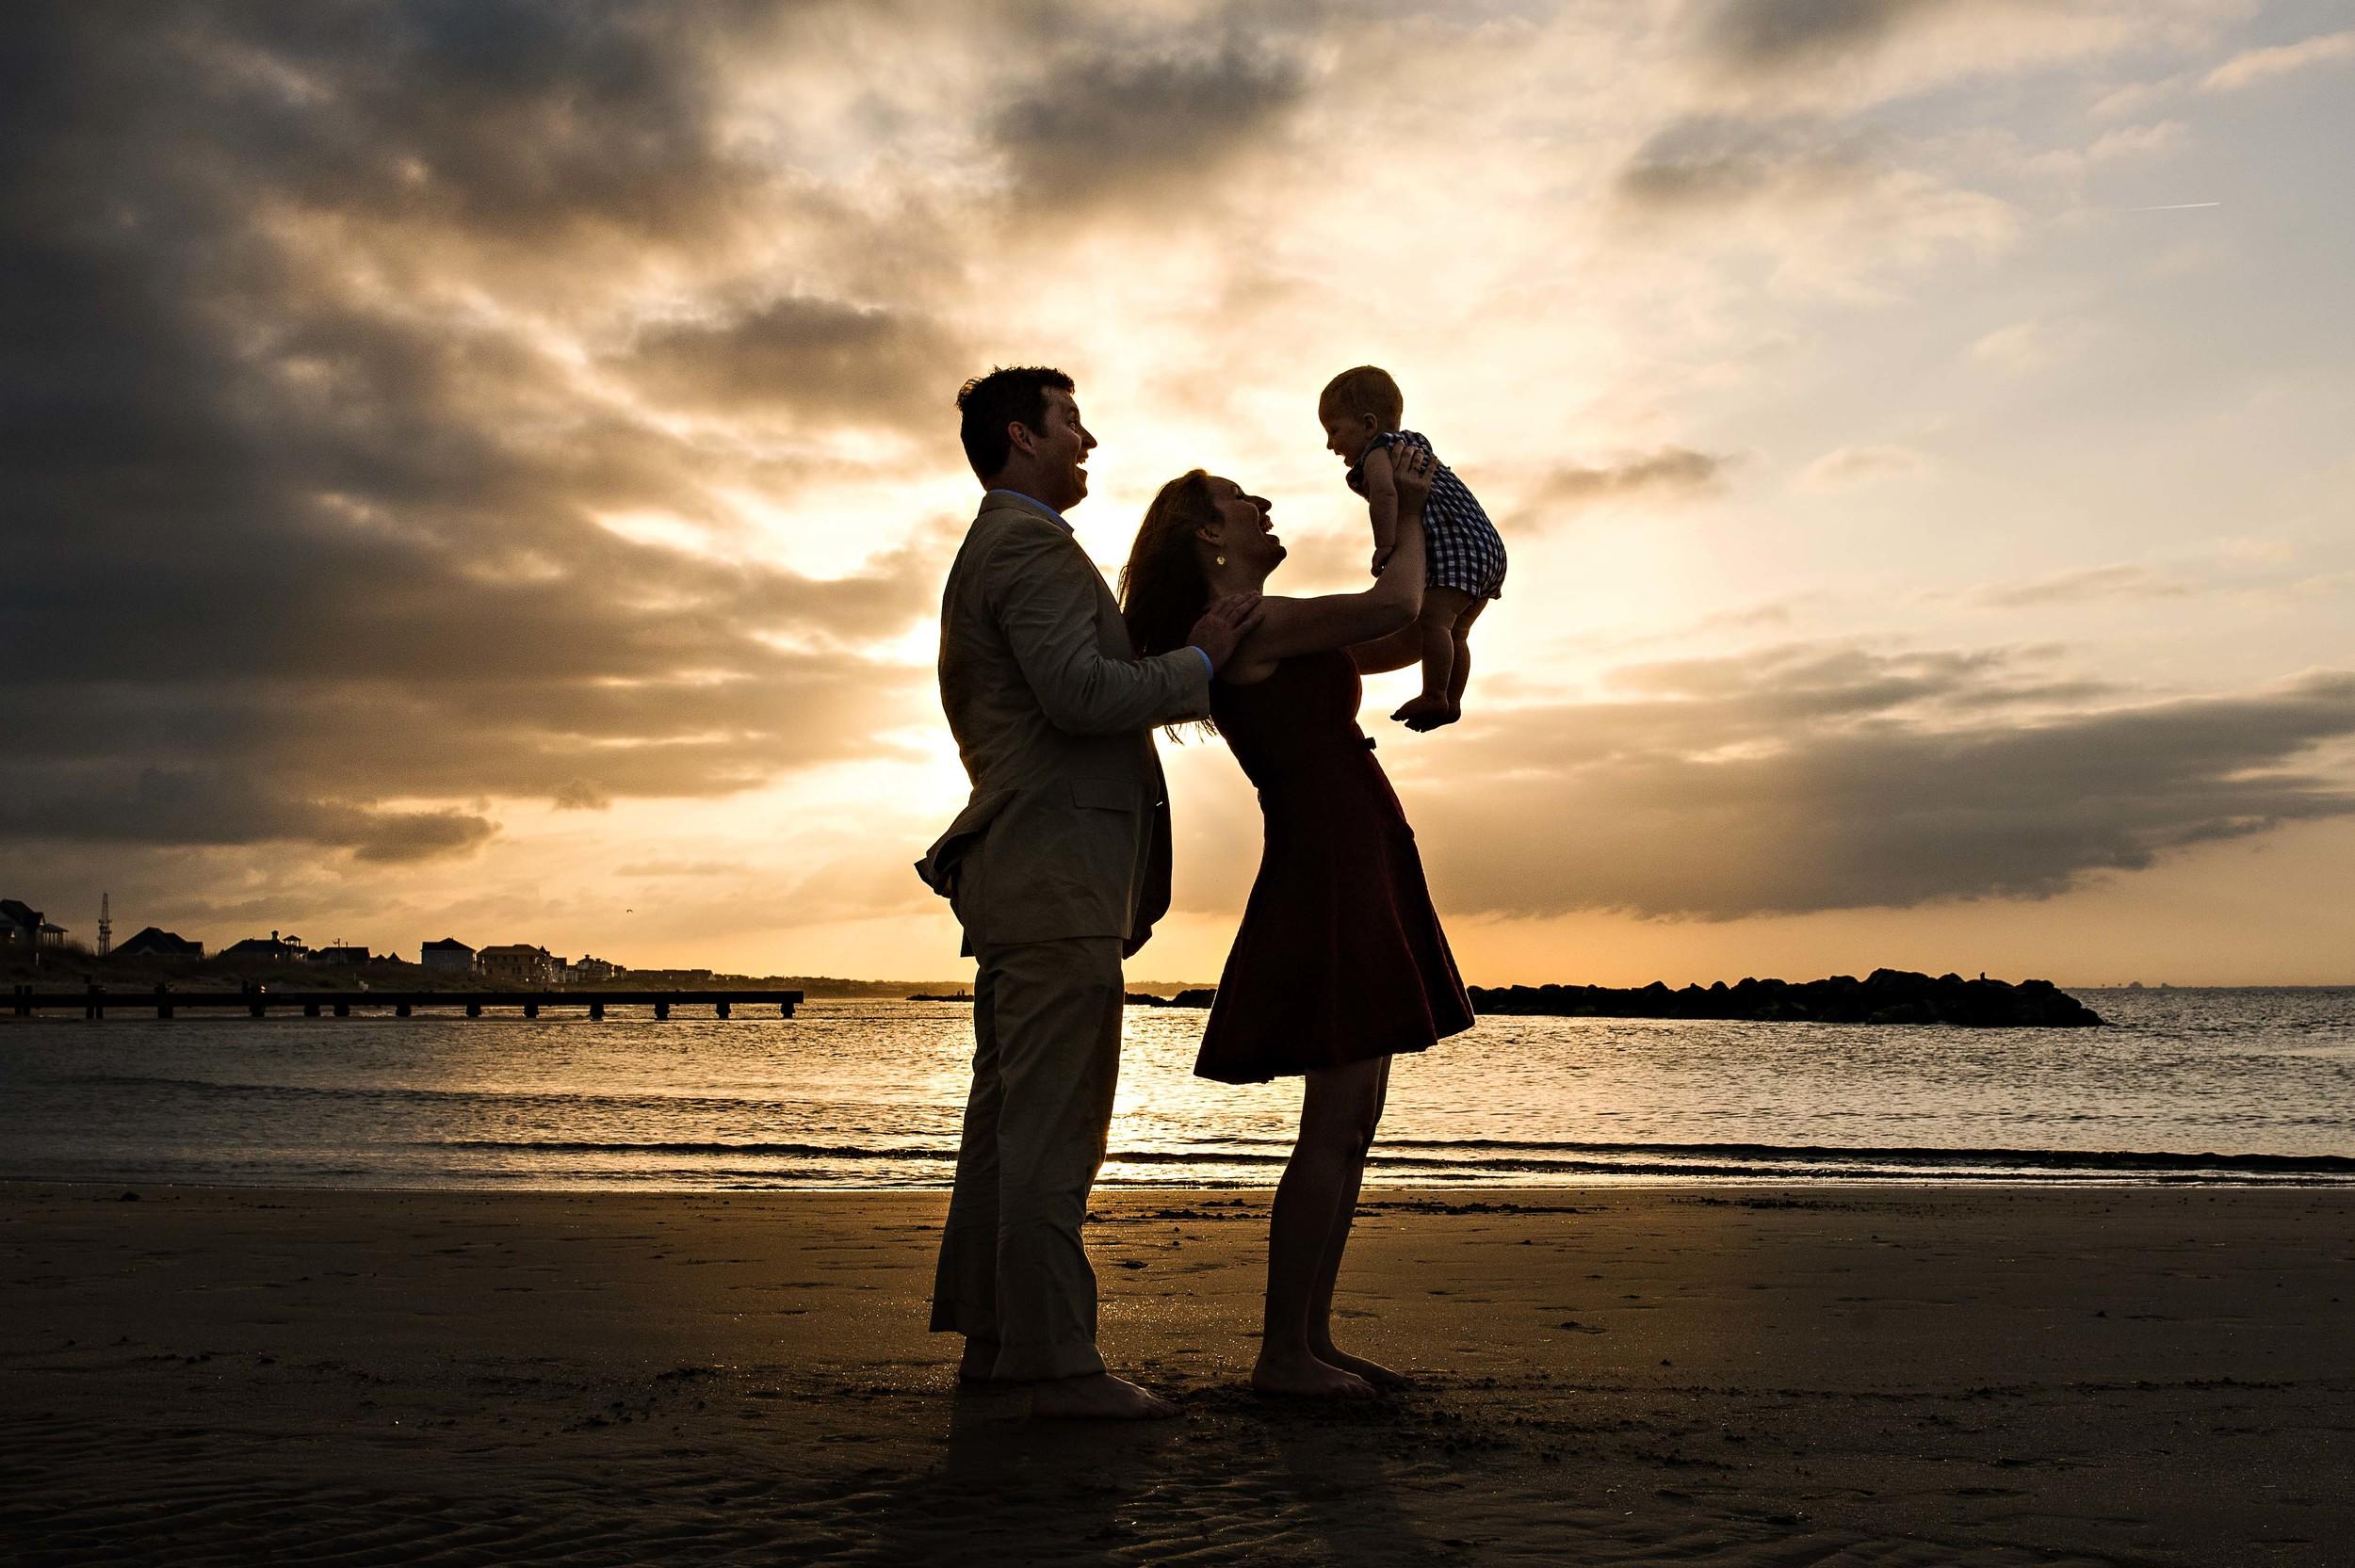 family-silhouette-on-the-beach-melissa-bliss-photography-virginia-beach-sandbridge-norfolk-chesapeake-photographers